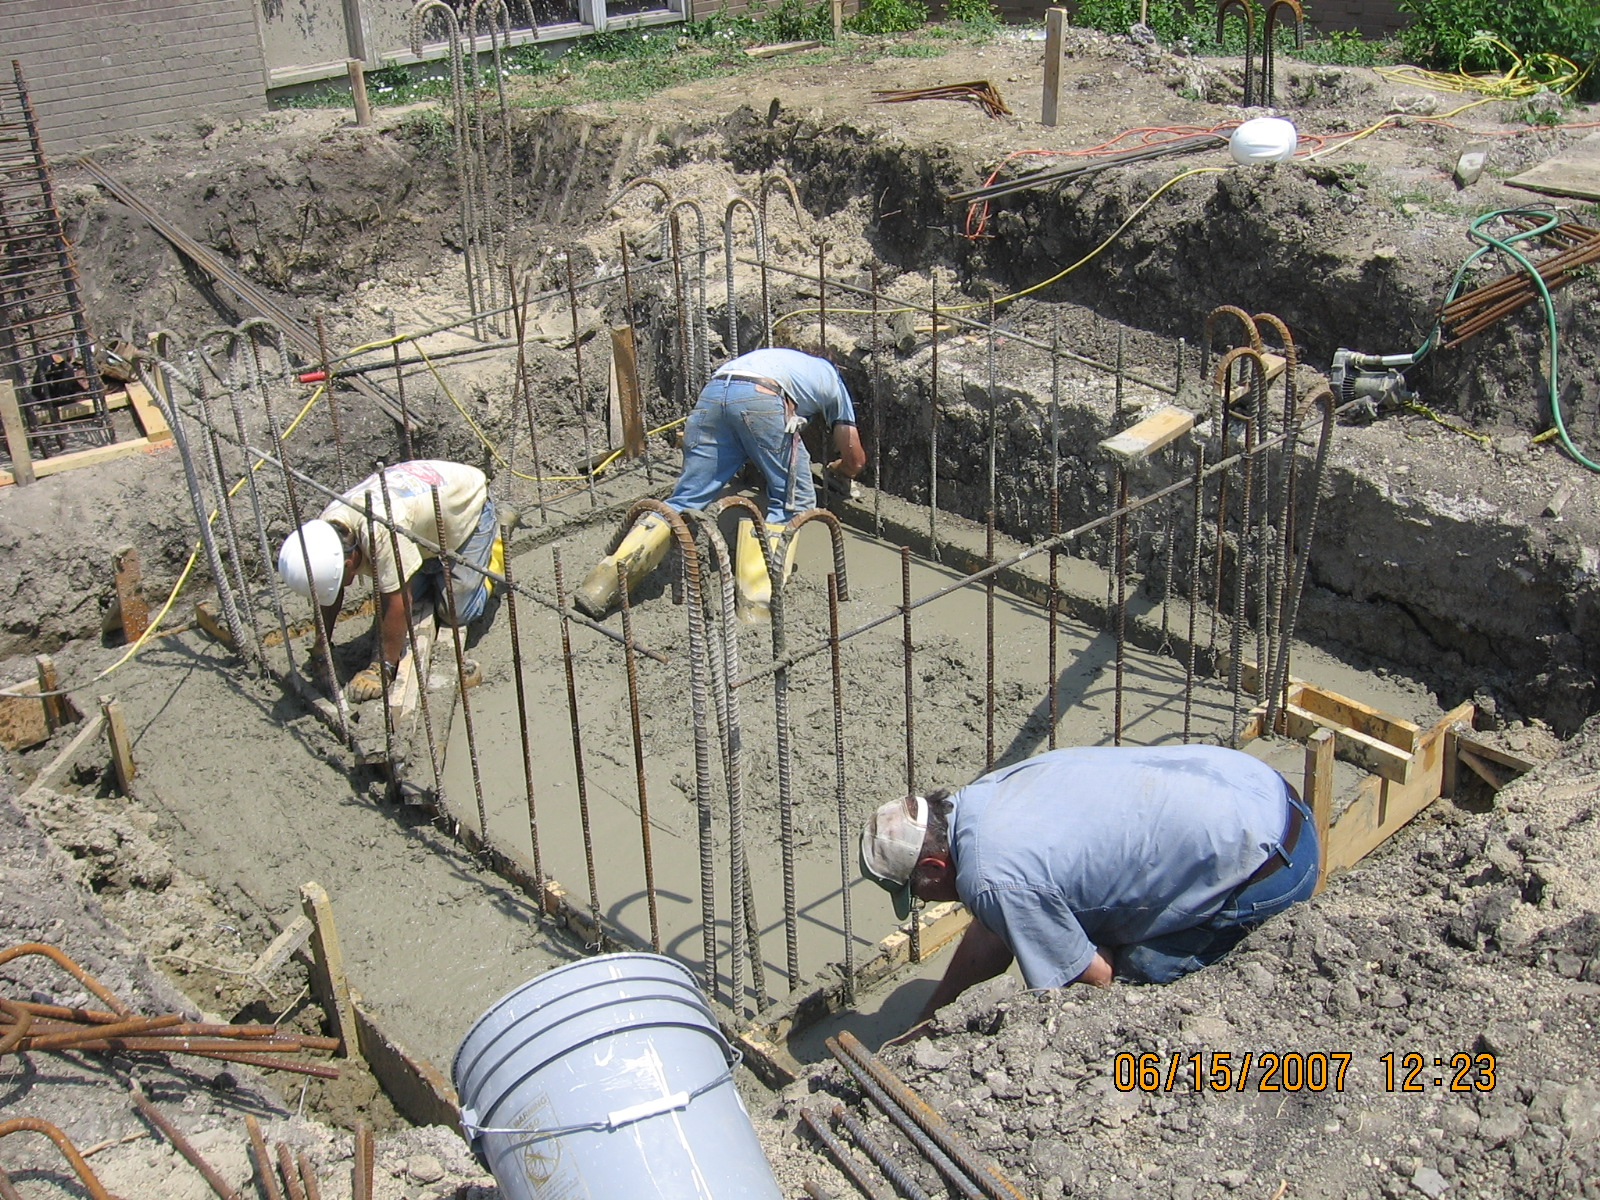 June 15, 2007